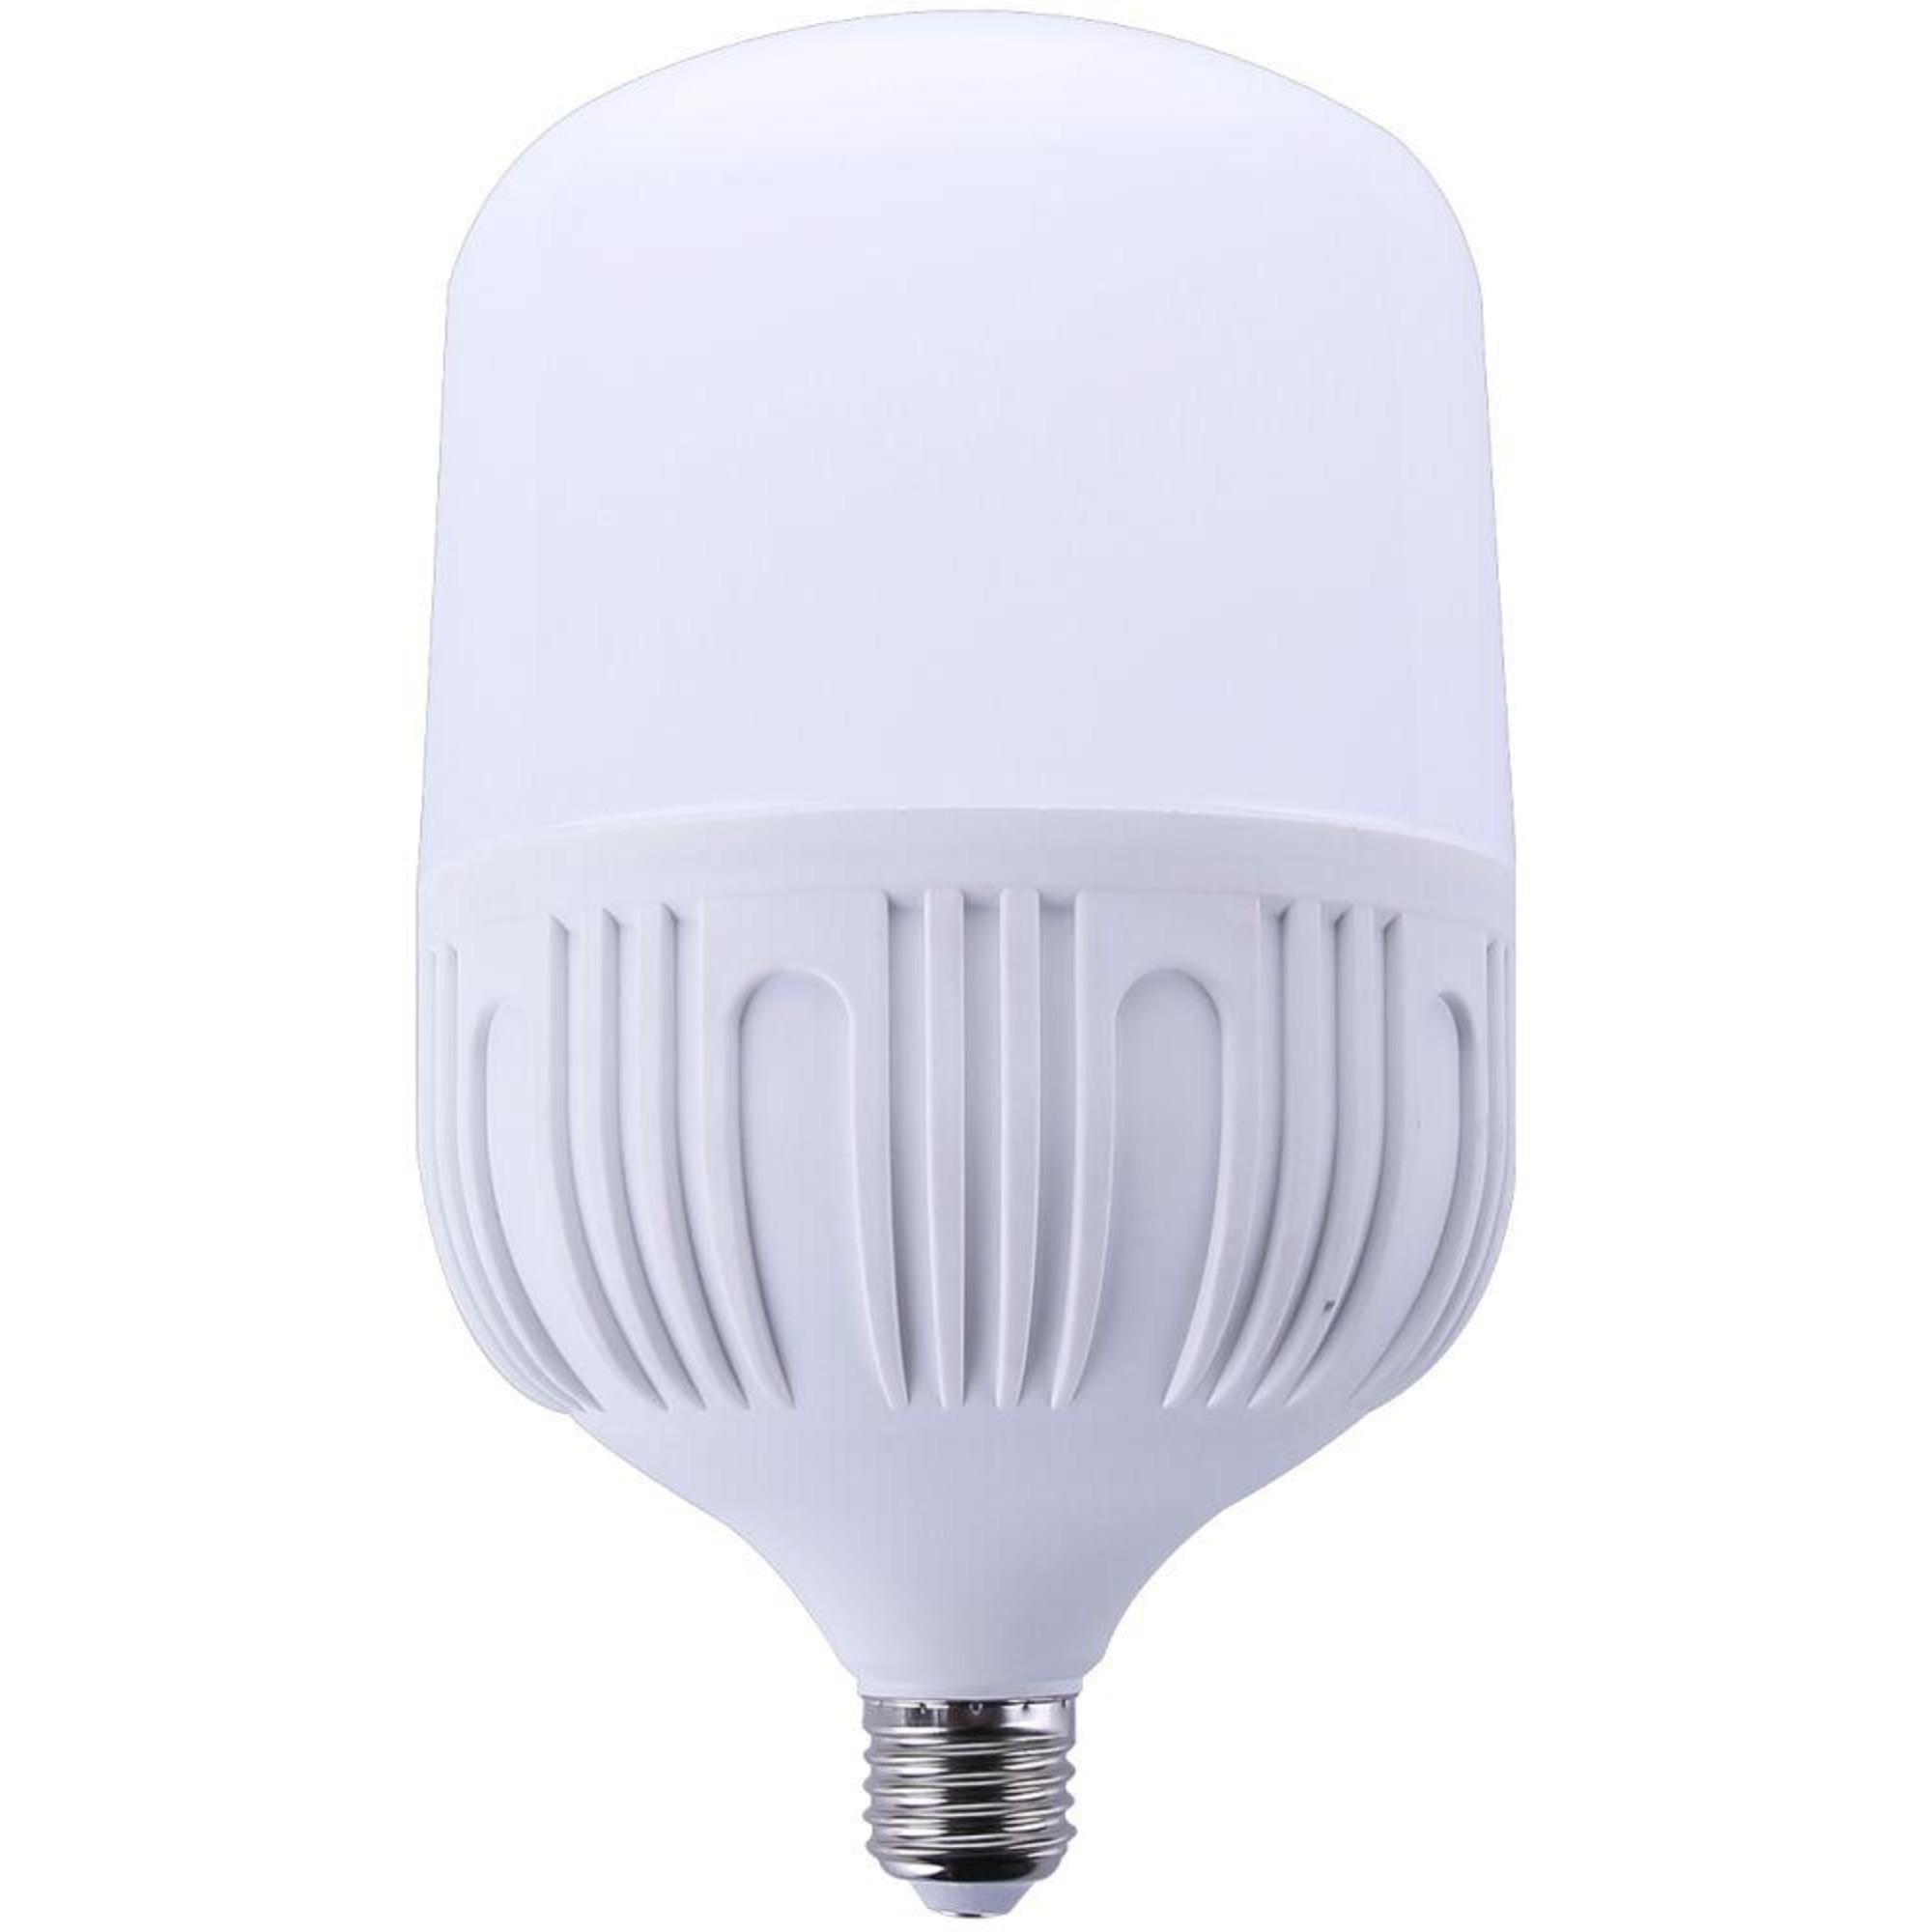 Лампа Ecola Premium светодионая E27 50 Вт 4500 Лм теплый свет